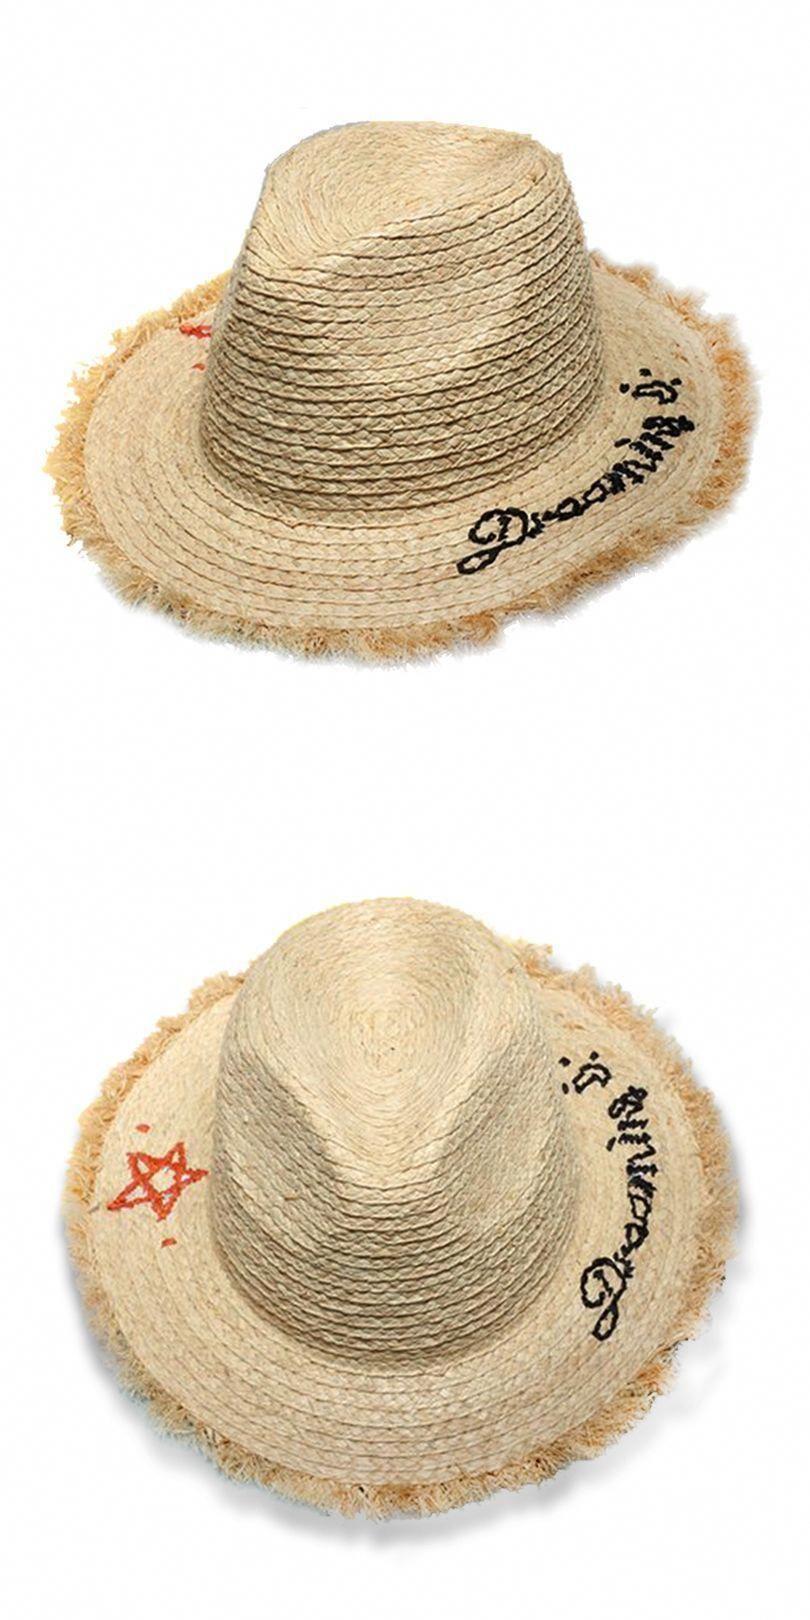 c398c5f77ecfc GGOMU NEW summer fashion sun hats for women Embroidery star letters Frawned  Rafi floppy ladies girls straw hat ZLH-005  HatsForWomenFloppy   ballhatsforwomen